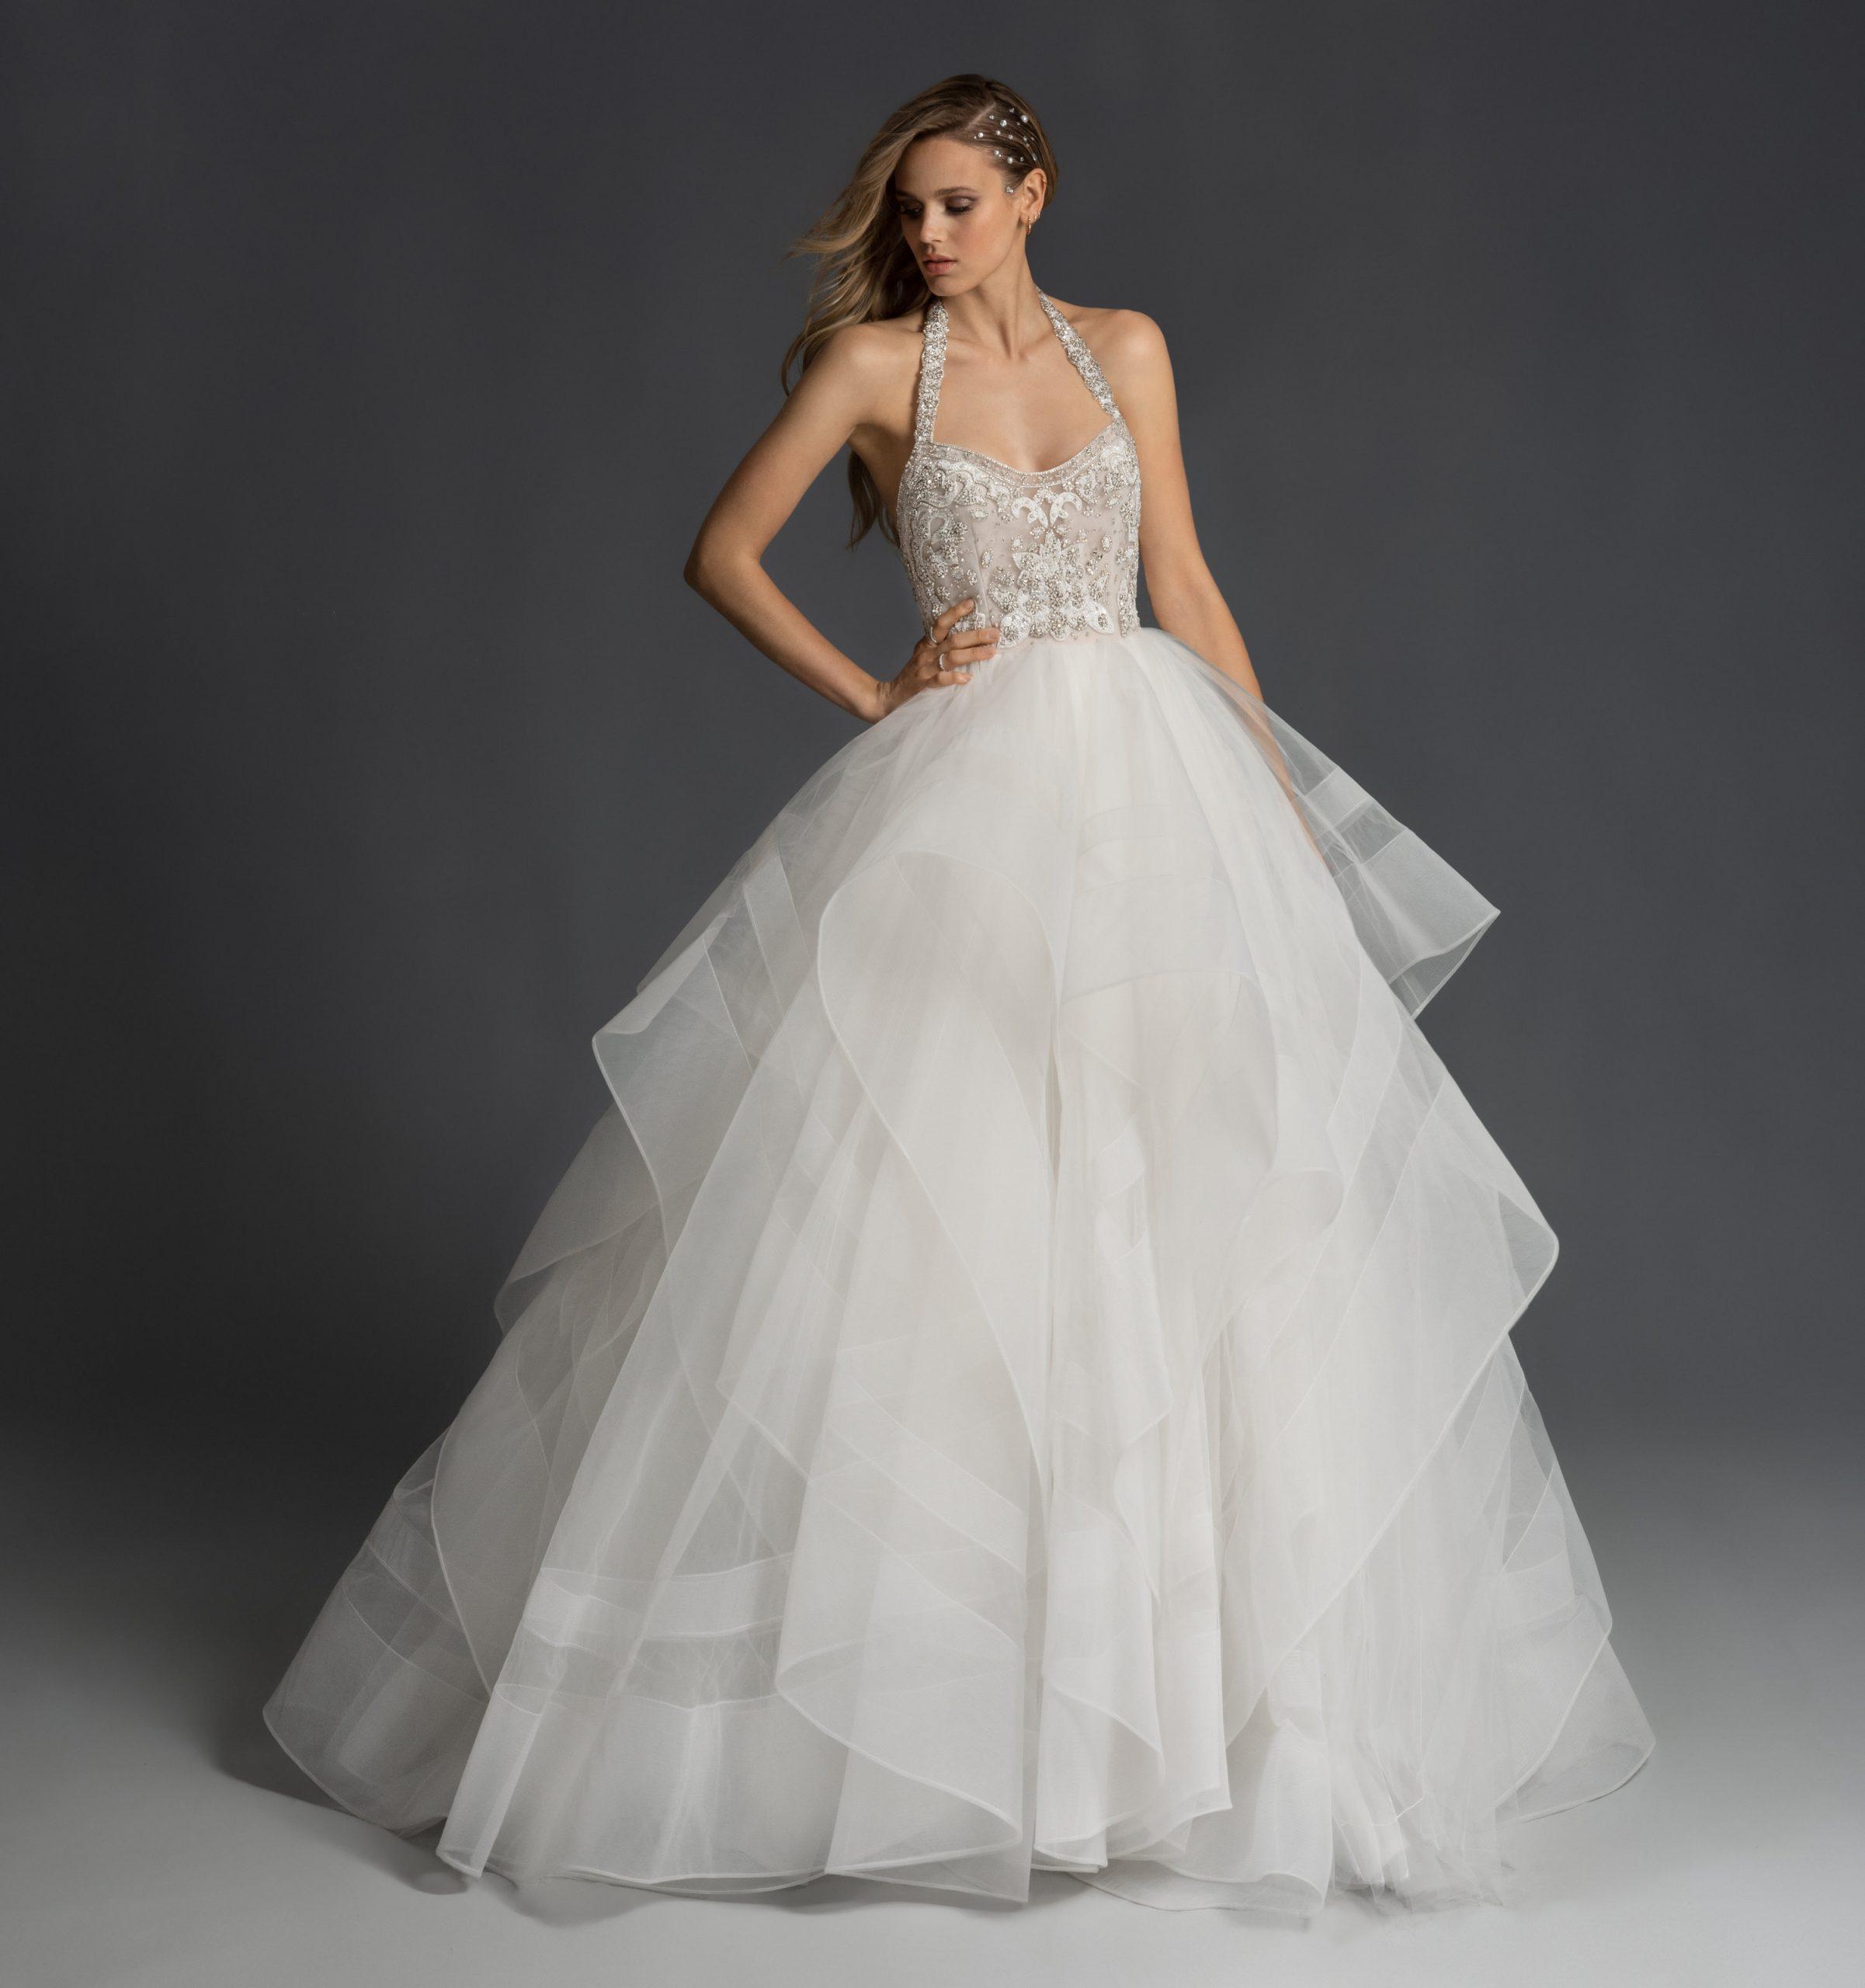 Halter Neckline Ballgown Wedding Dress With Beaded Bodice And Straps Kleinfeld Bridal